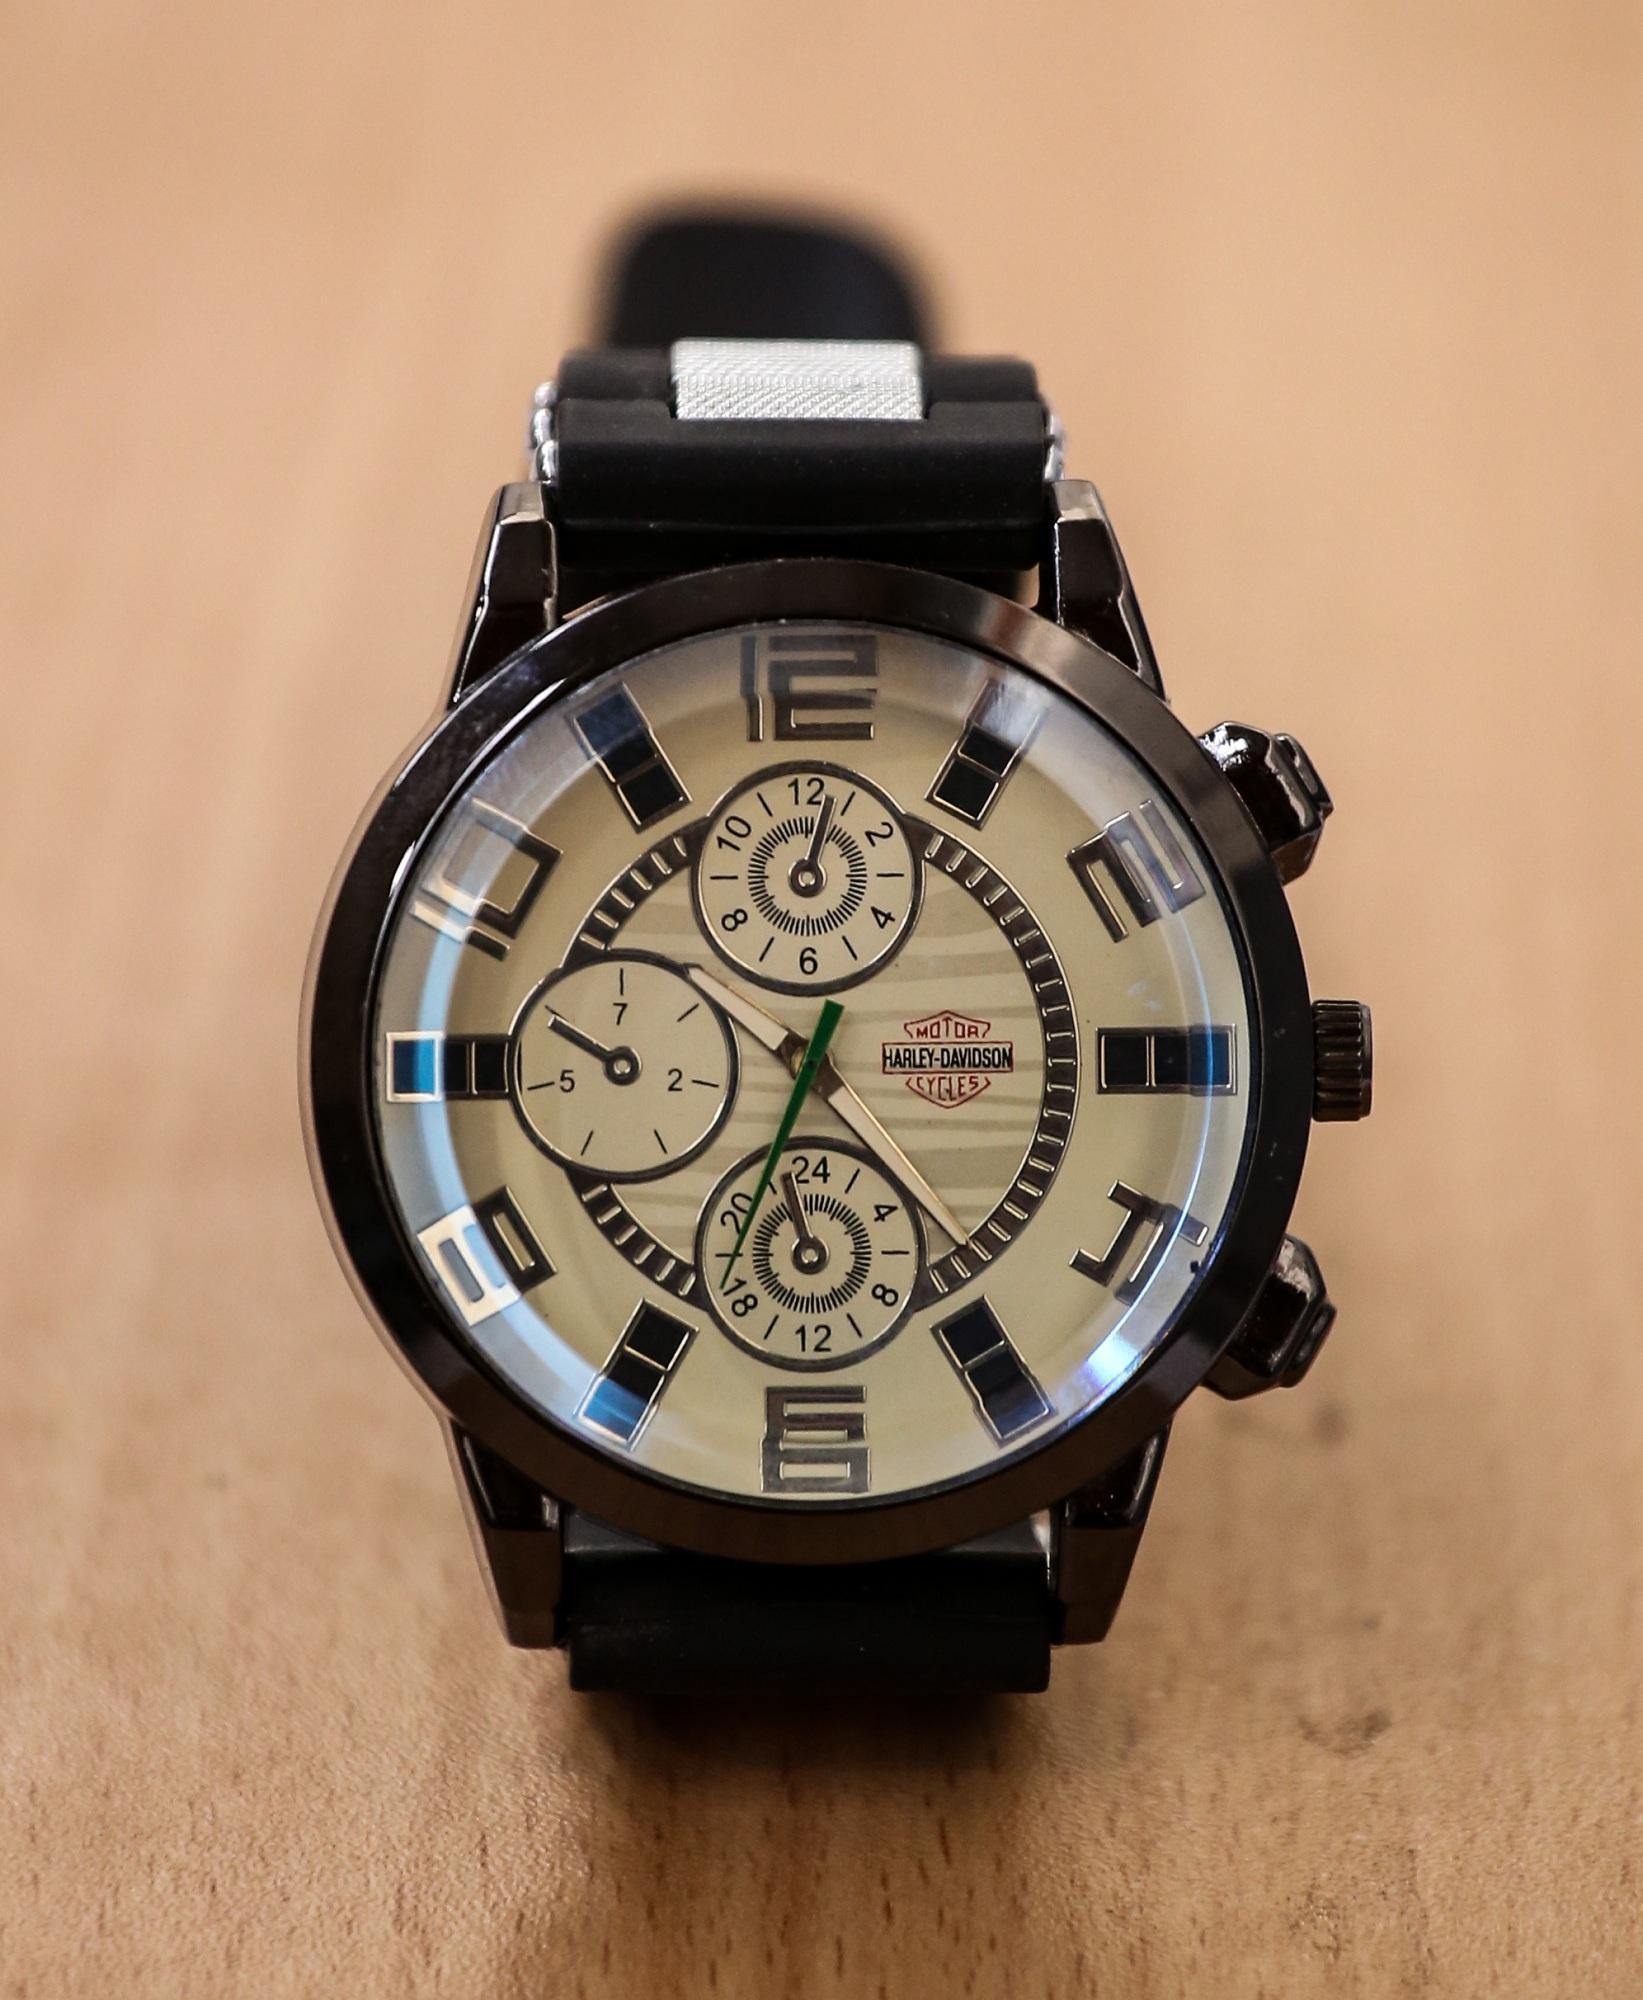 41ec74f27af Black Leather Analog Watch For Men: Buy Online at Best Prices in ...